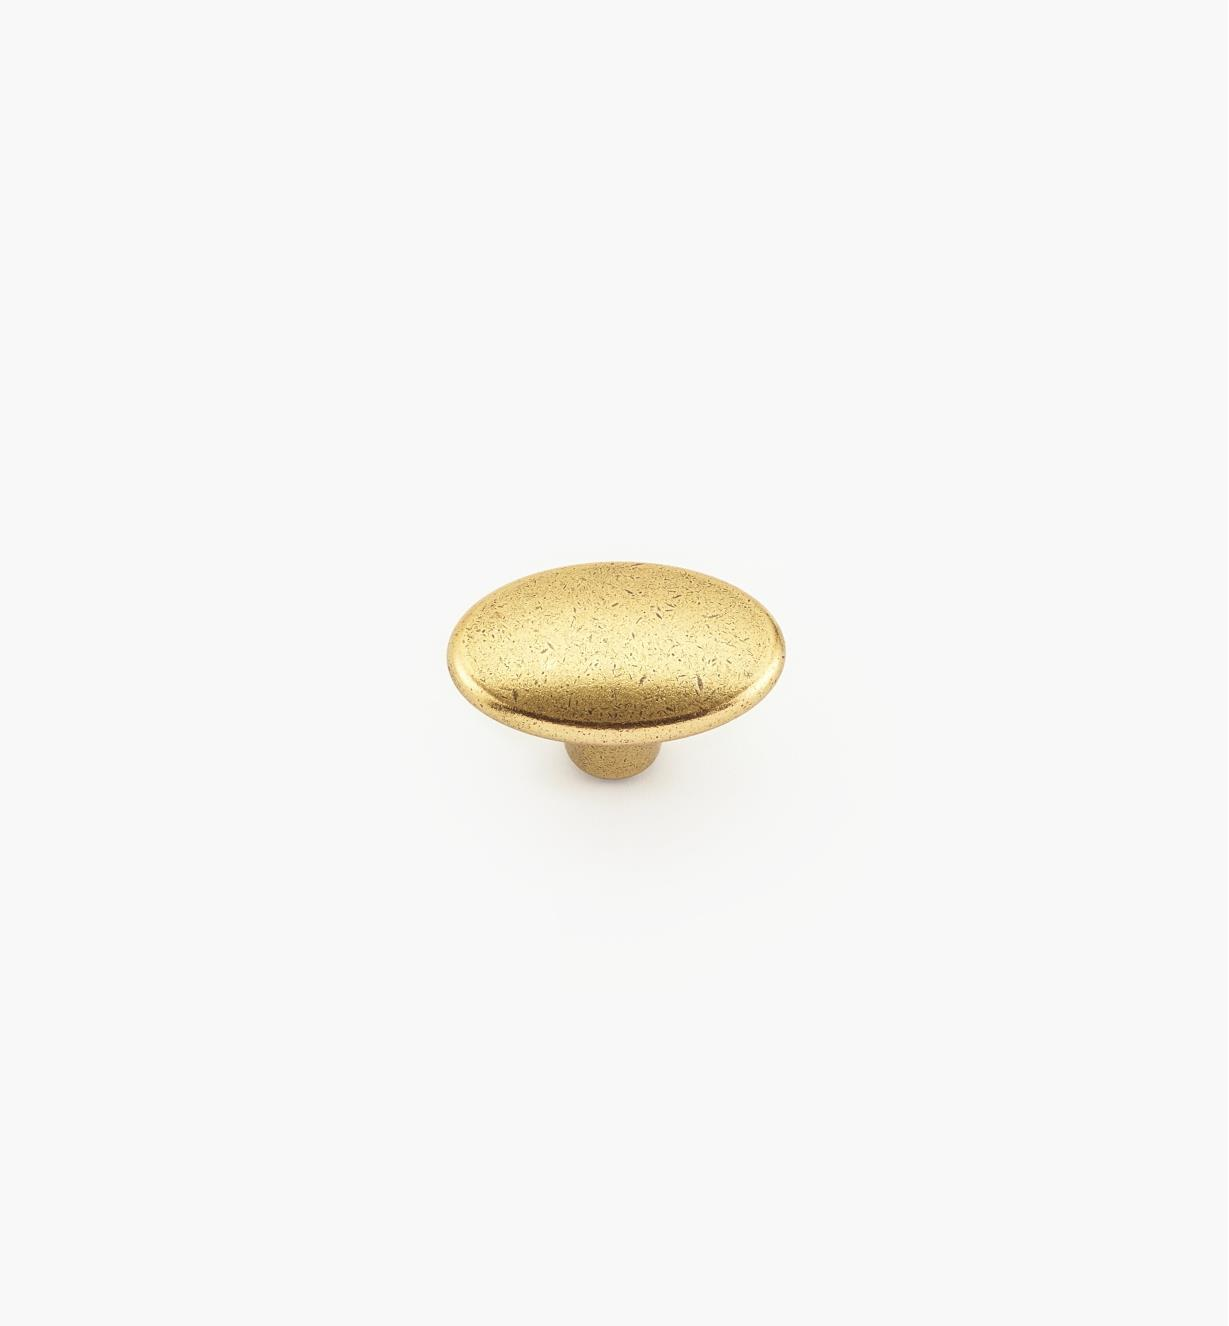 00A7161 - Bouton ovale de 37mmx 24mm, fini bronze bruni